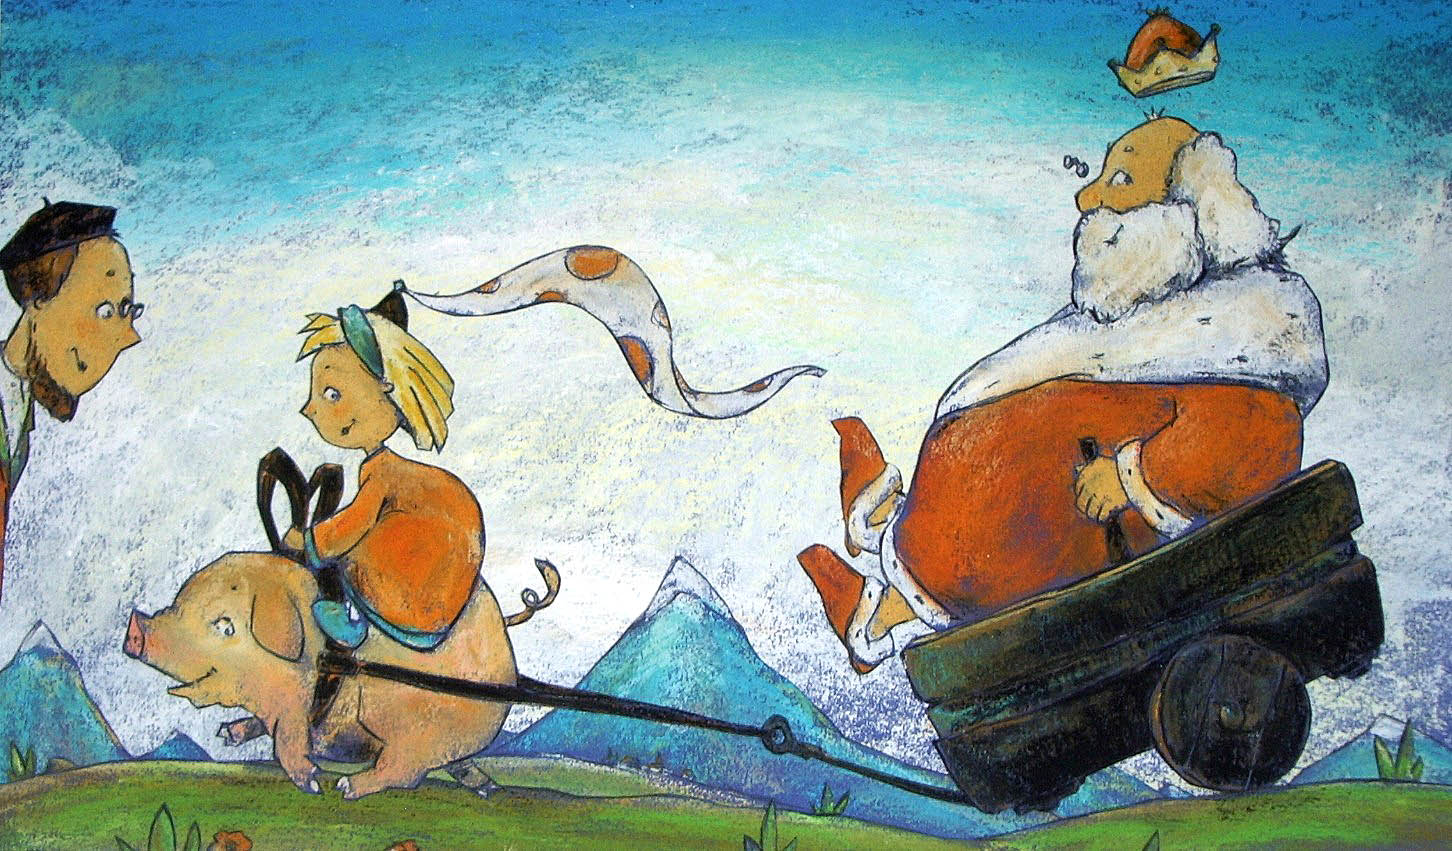 Jule und die Traumvögel © Dieter Konsek, Bilderbuch